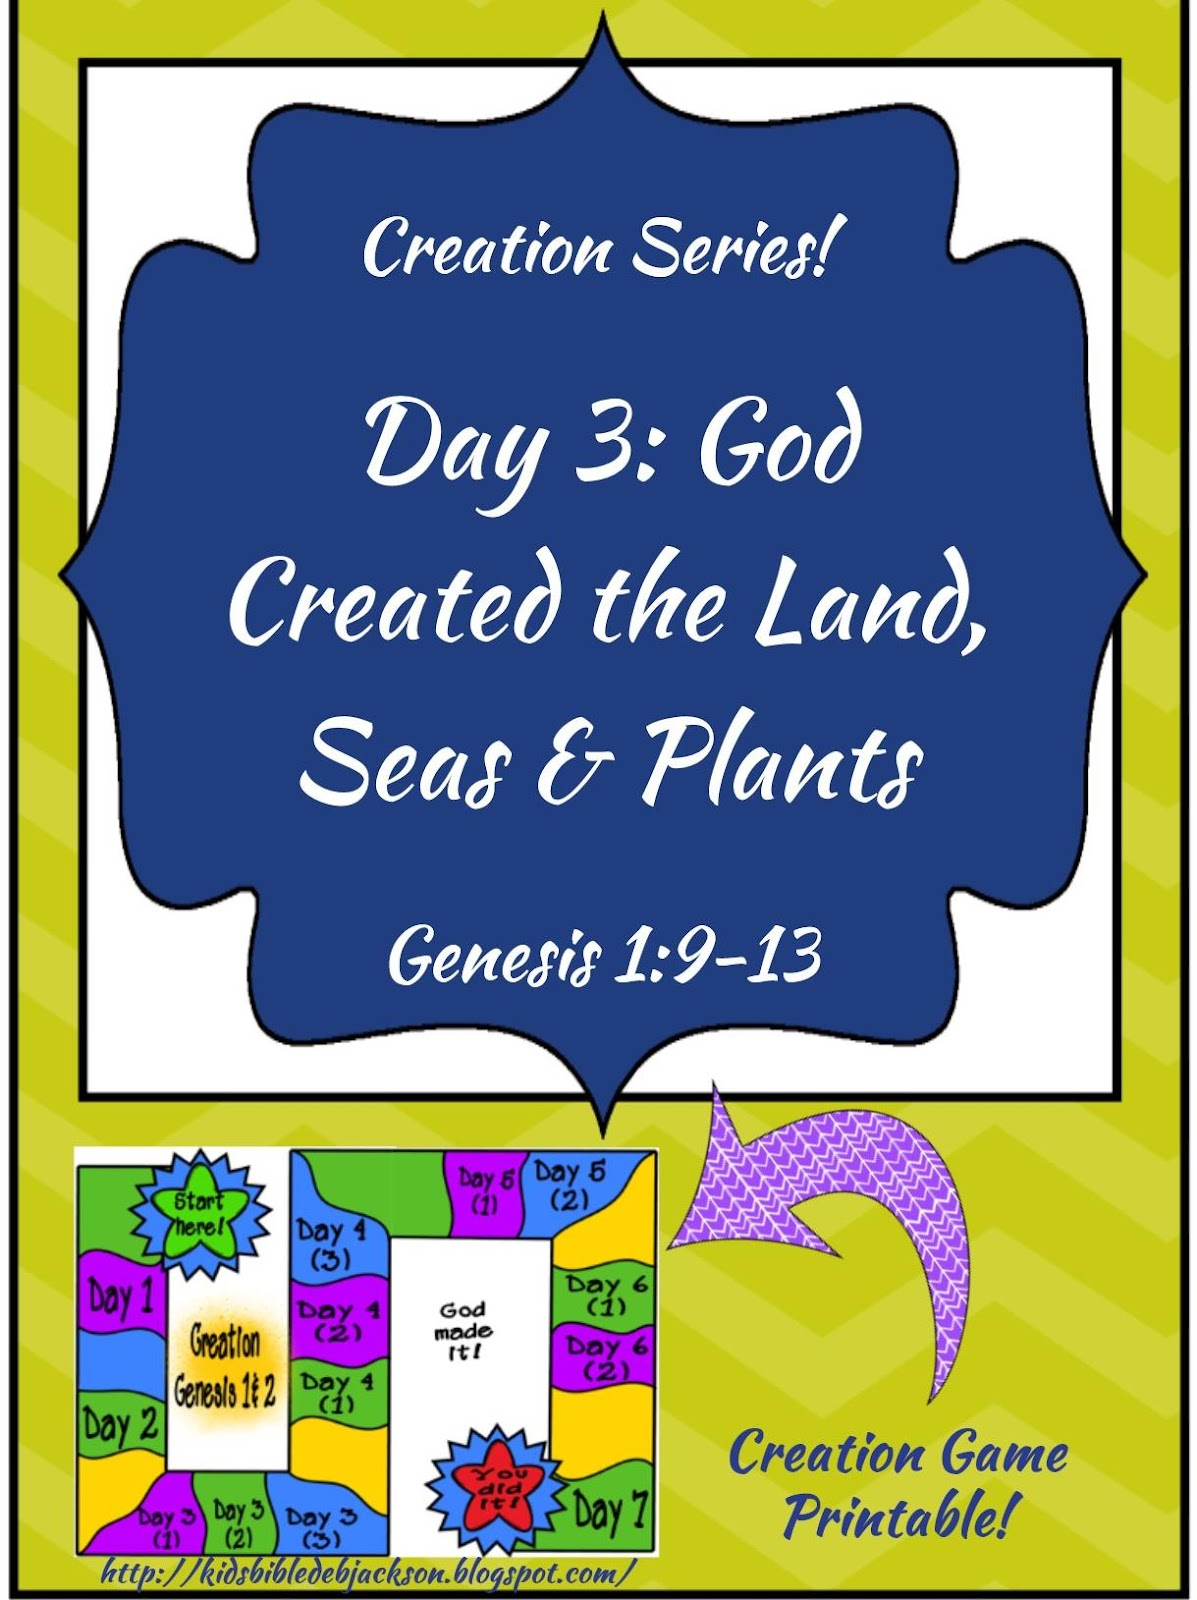 http://kidsbibledebjackson.blogspot.com/2015/01/the-creation-for-kids-day-3.html